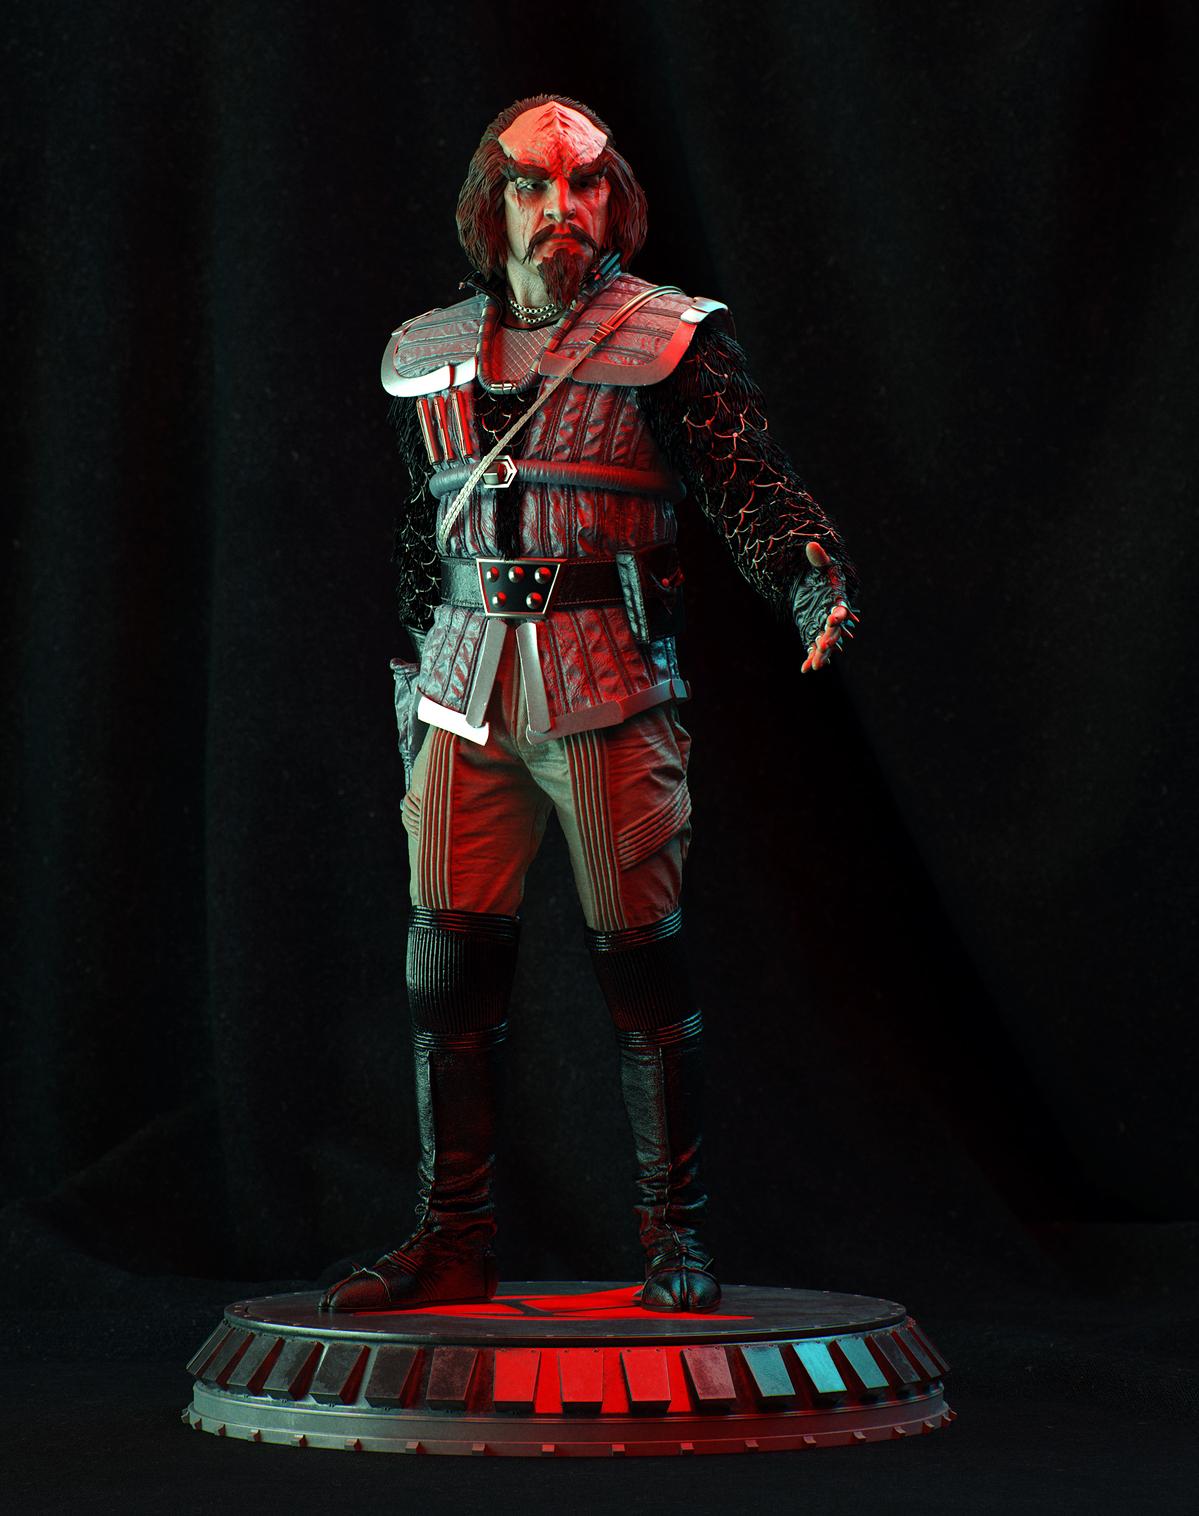 Klingon_Red_4